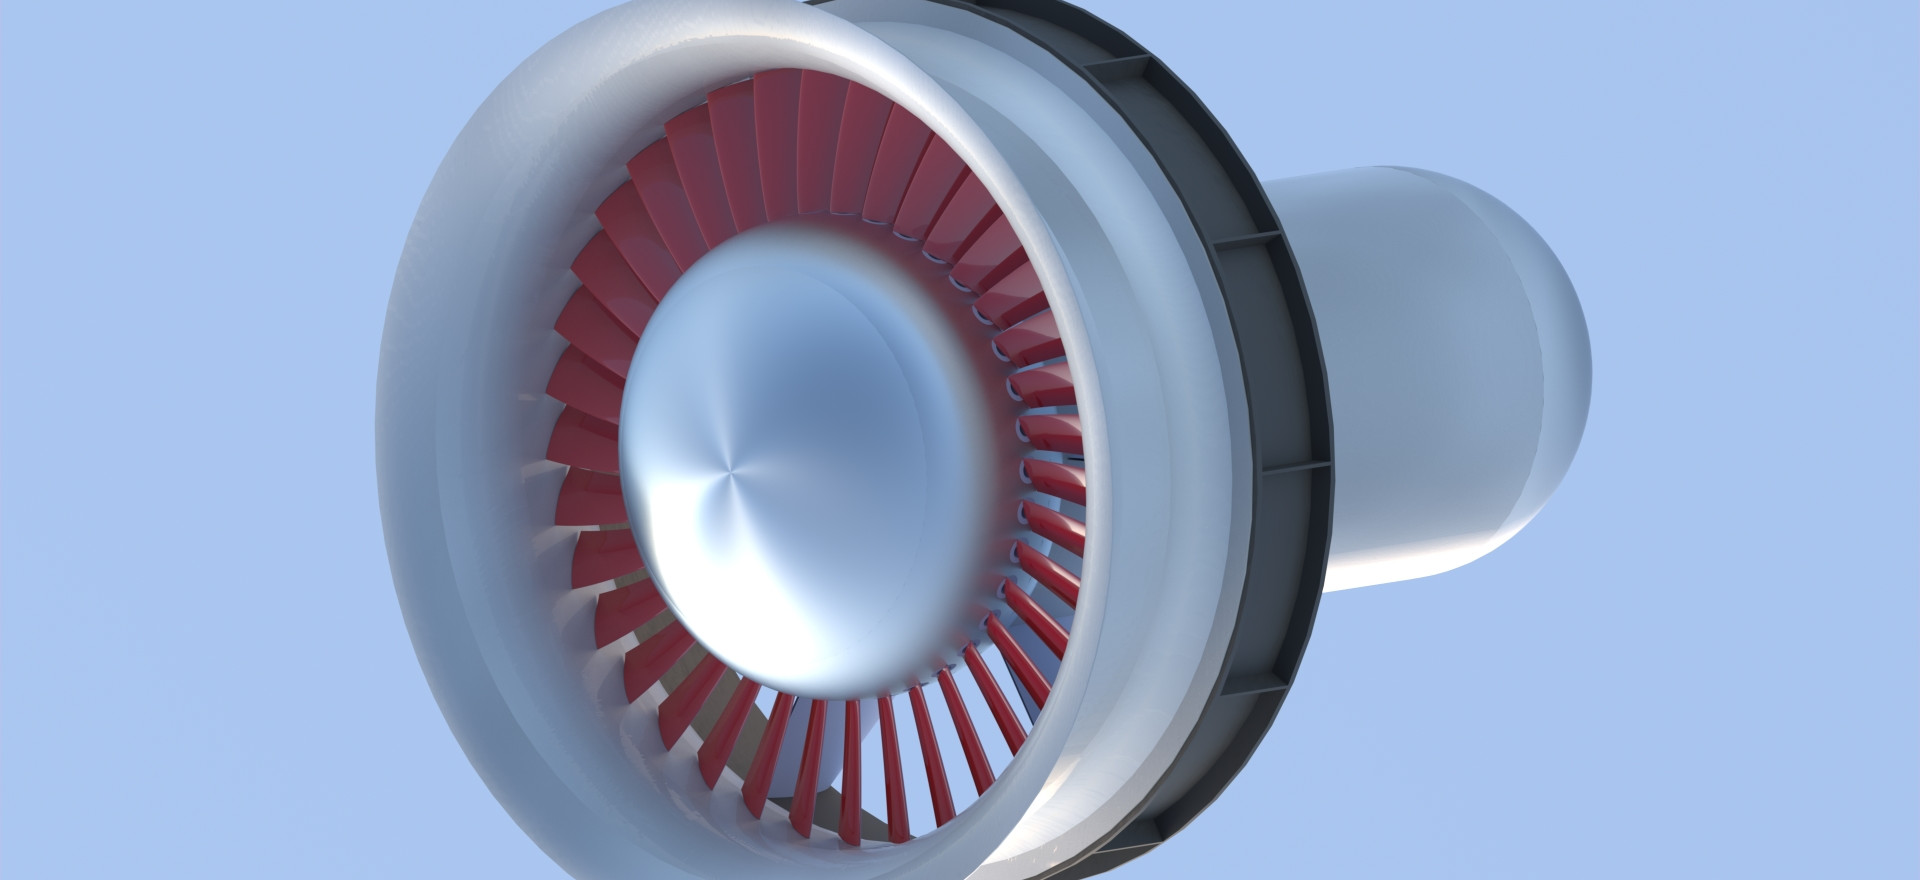 3rd generation turbine concept design